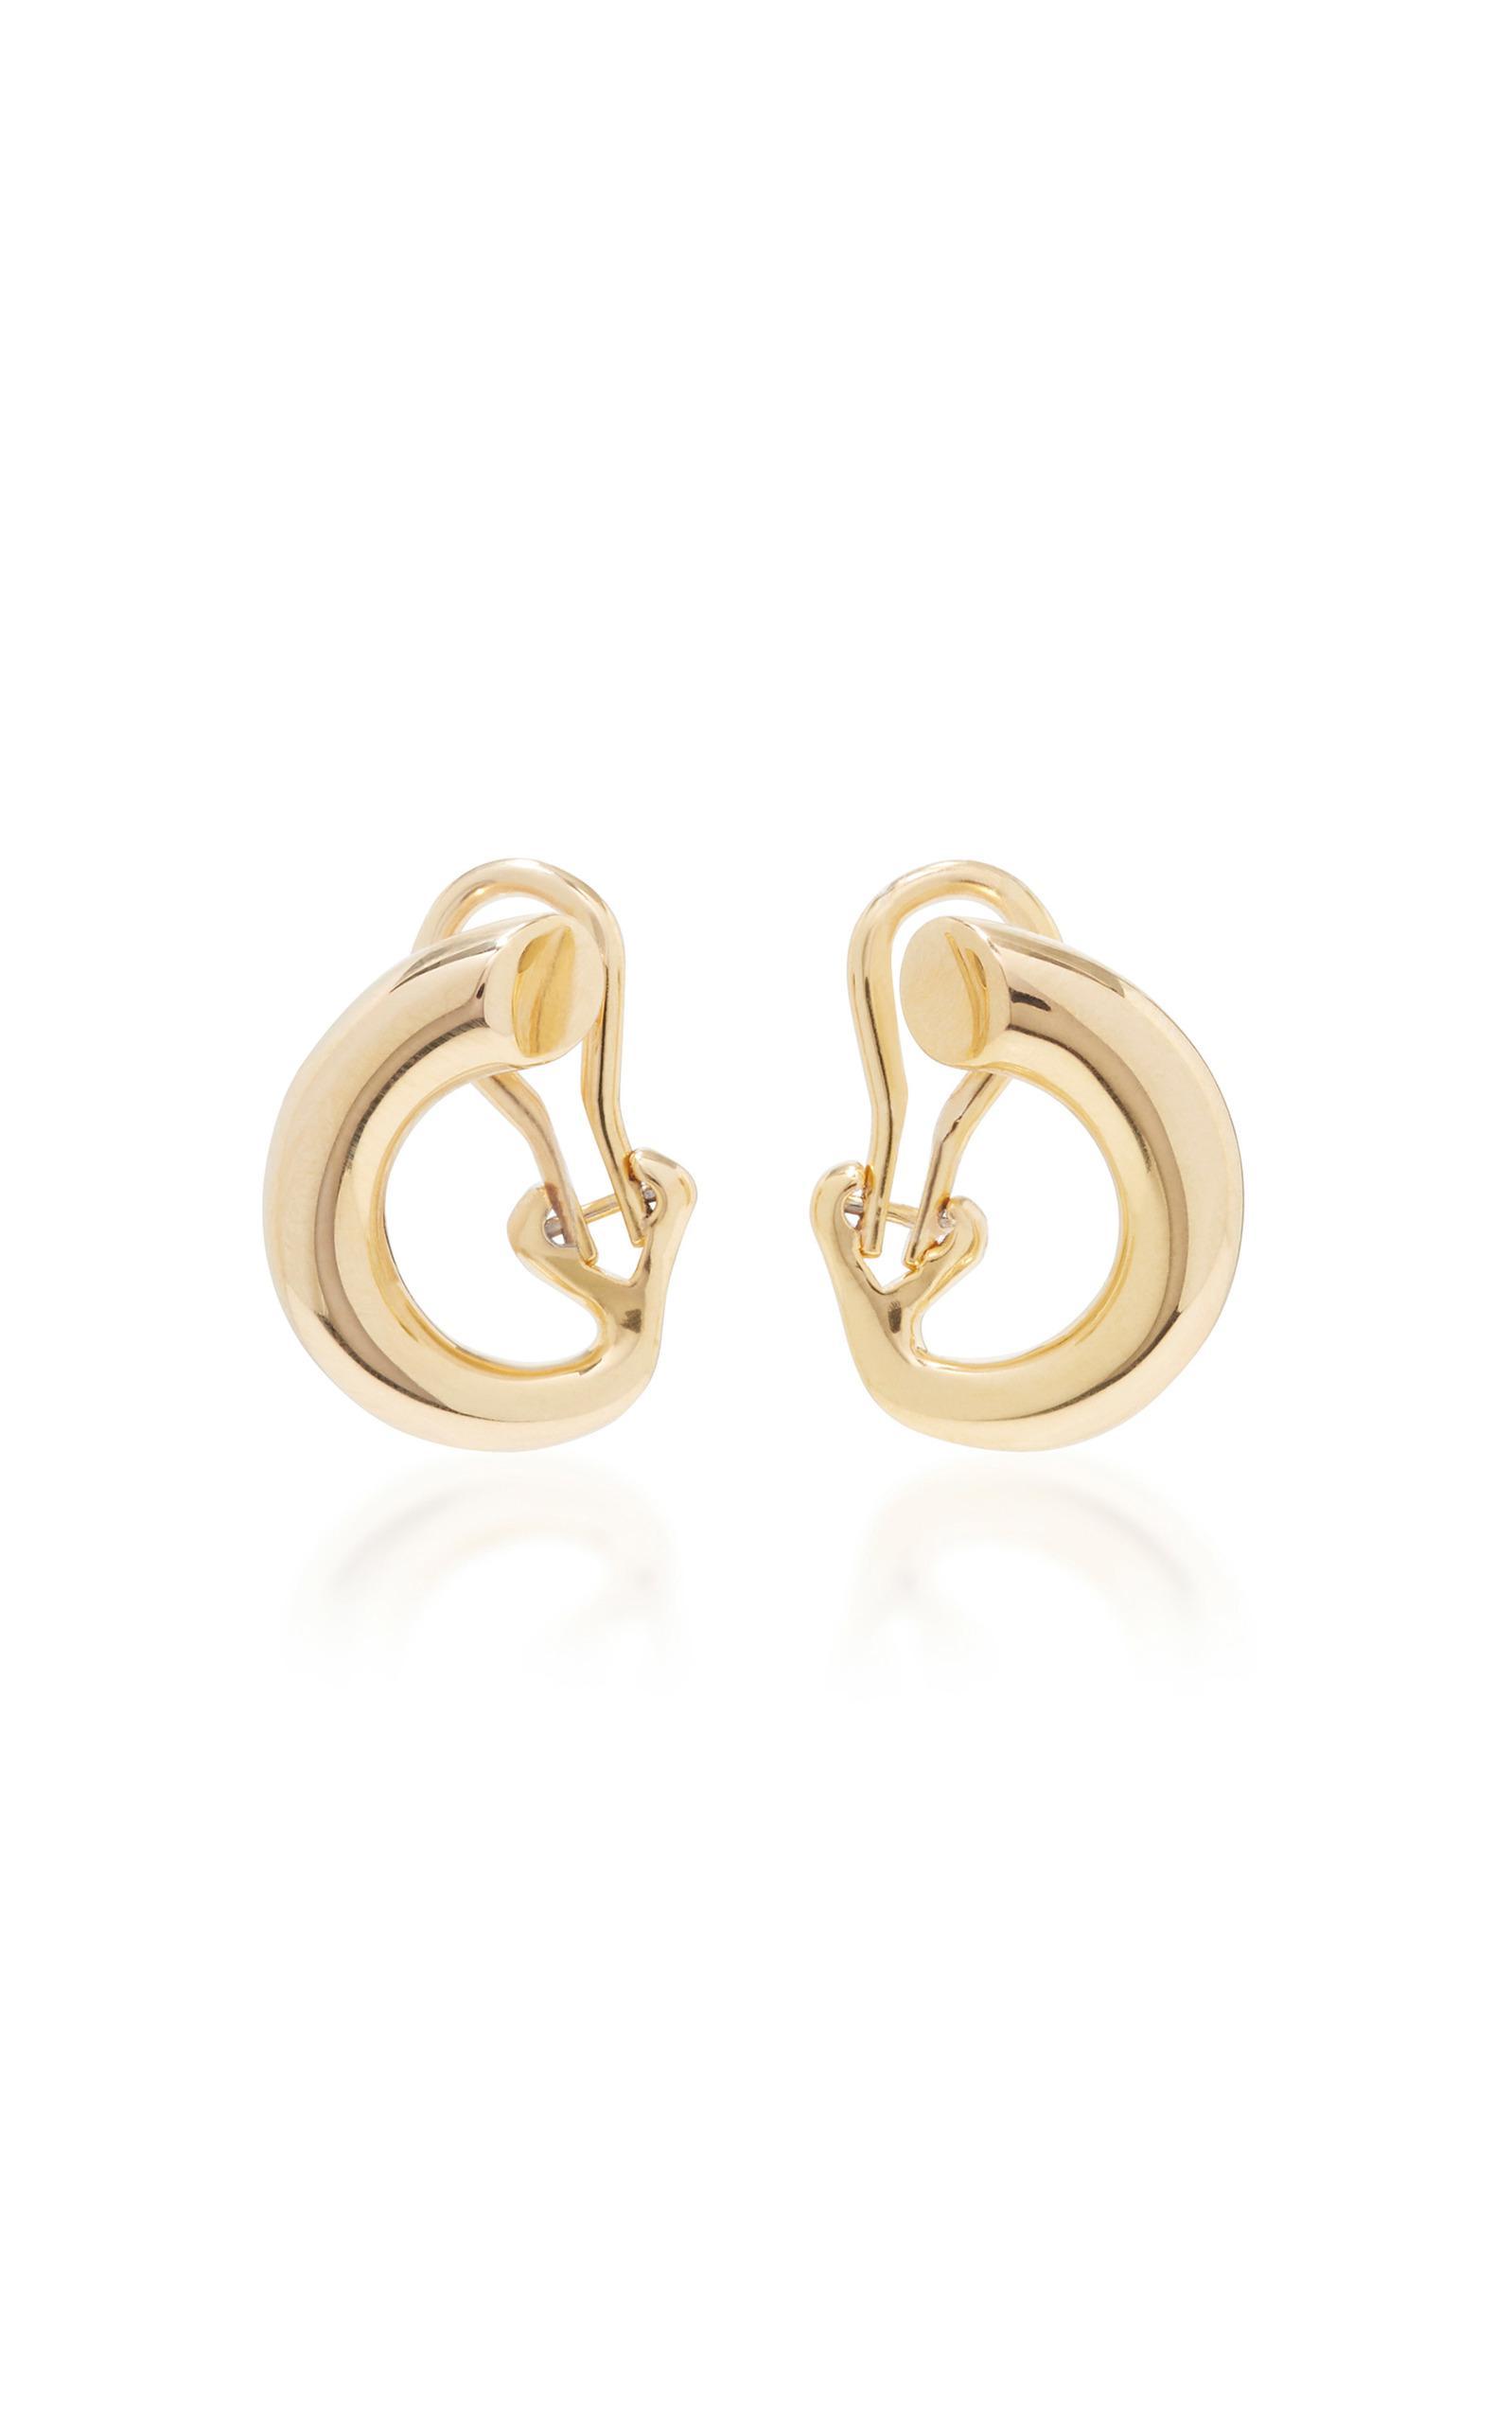 19c9006c8 Charlotte Chesnais Monie Small Gold-dipped Clip Earrings in Metallic ...